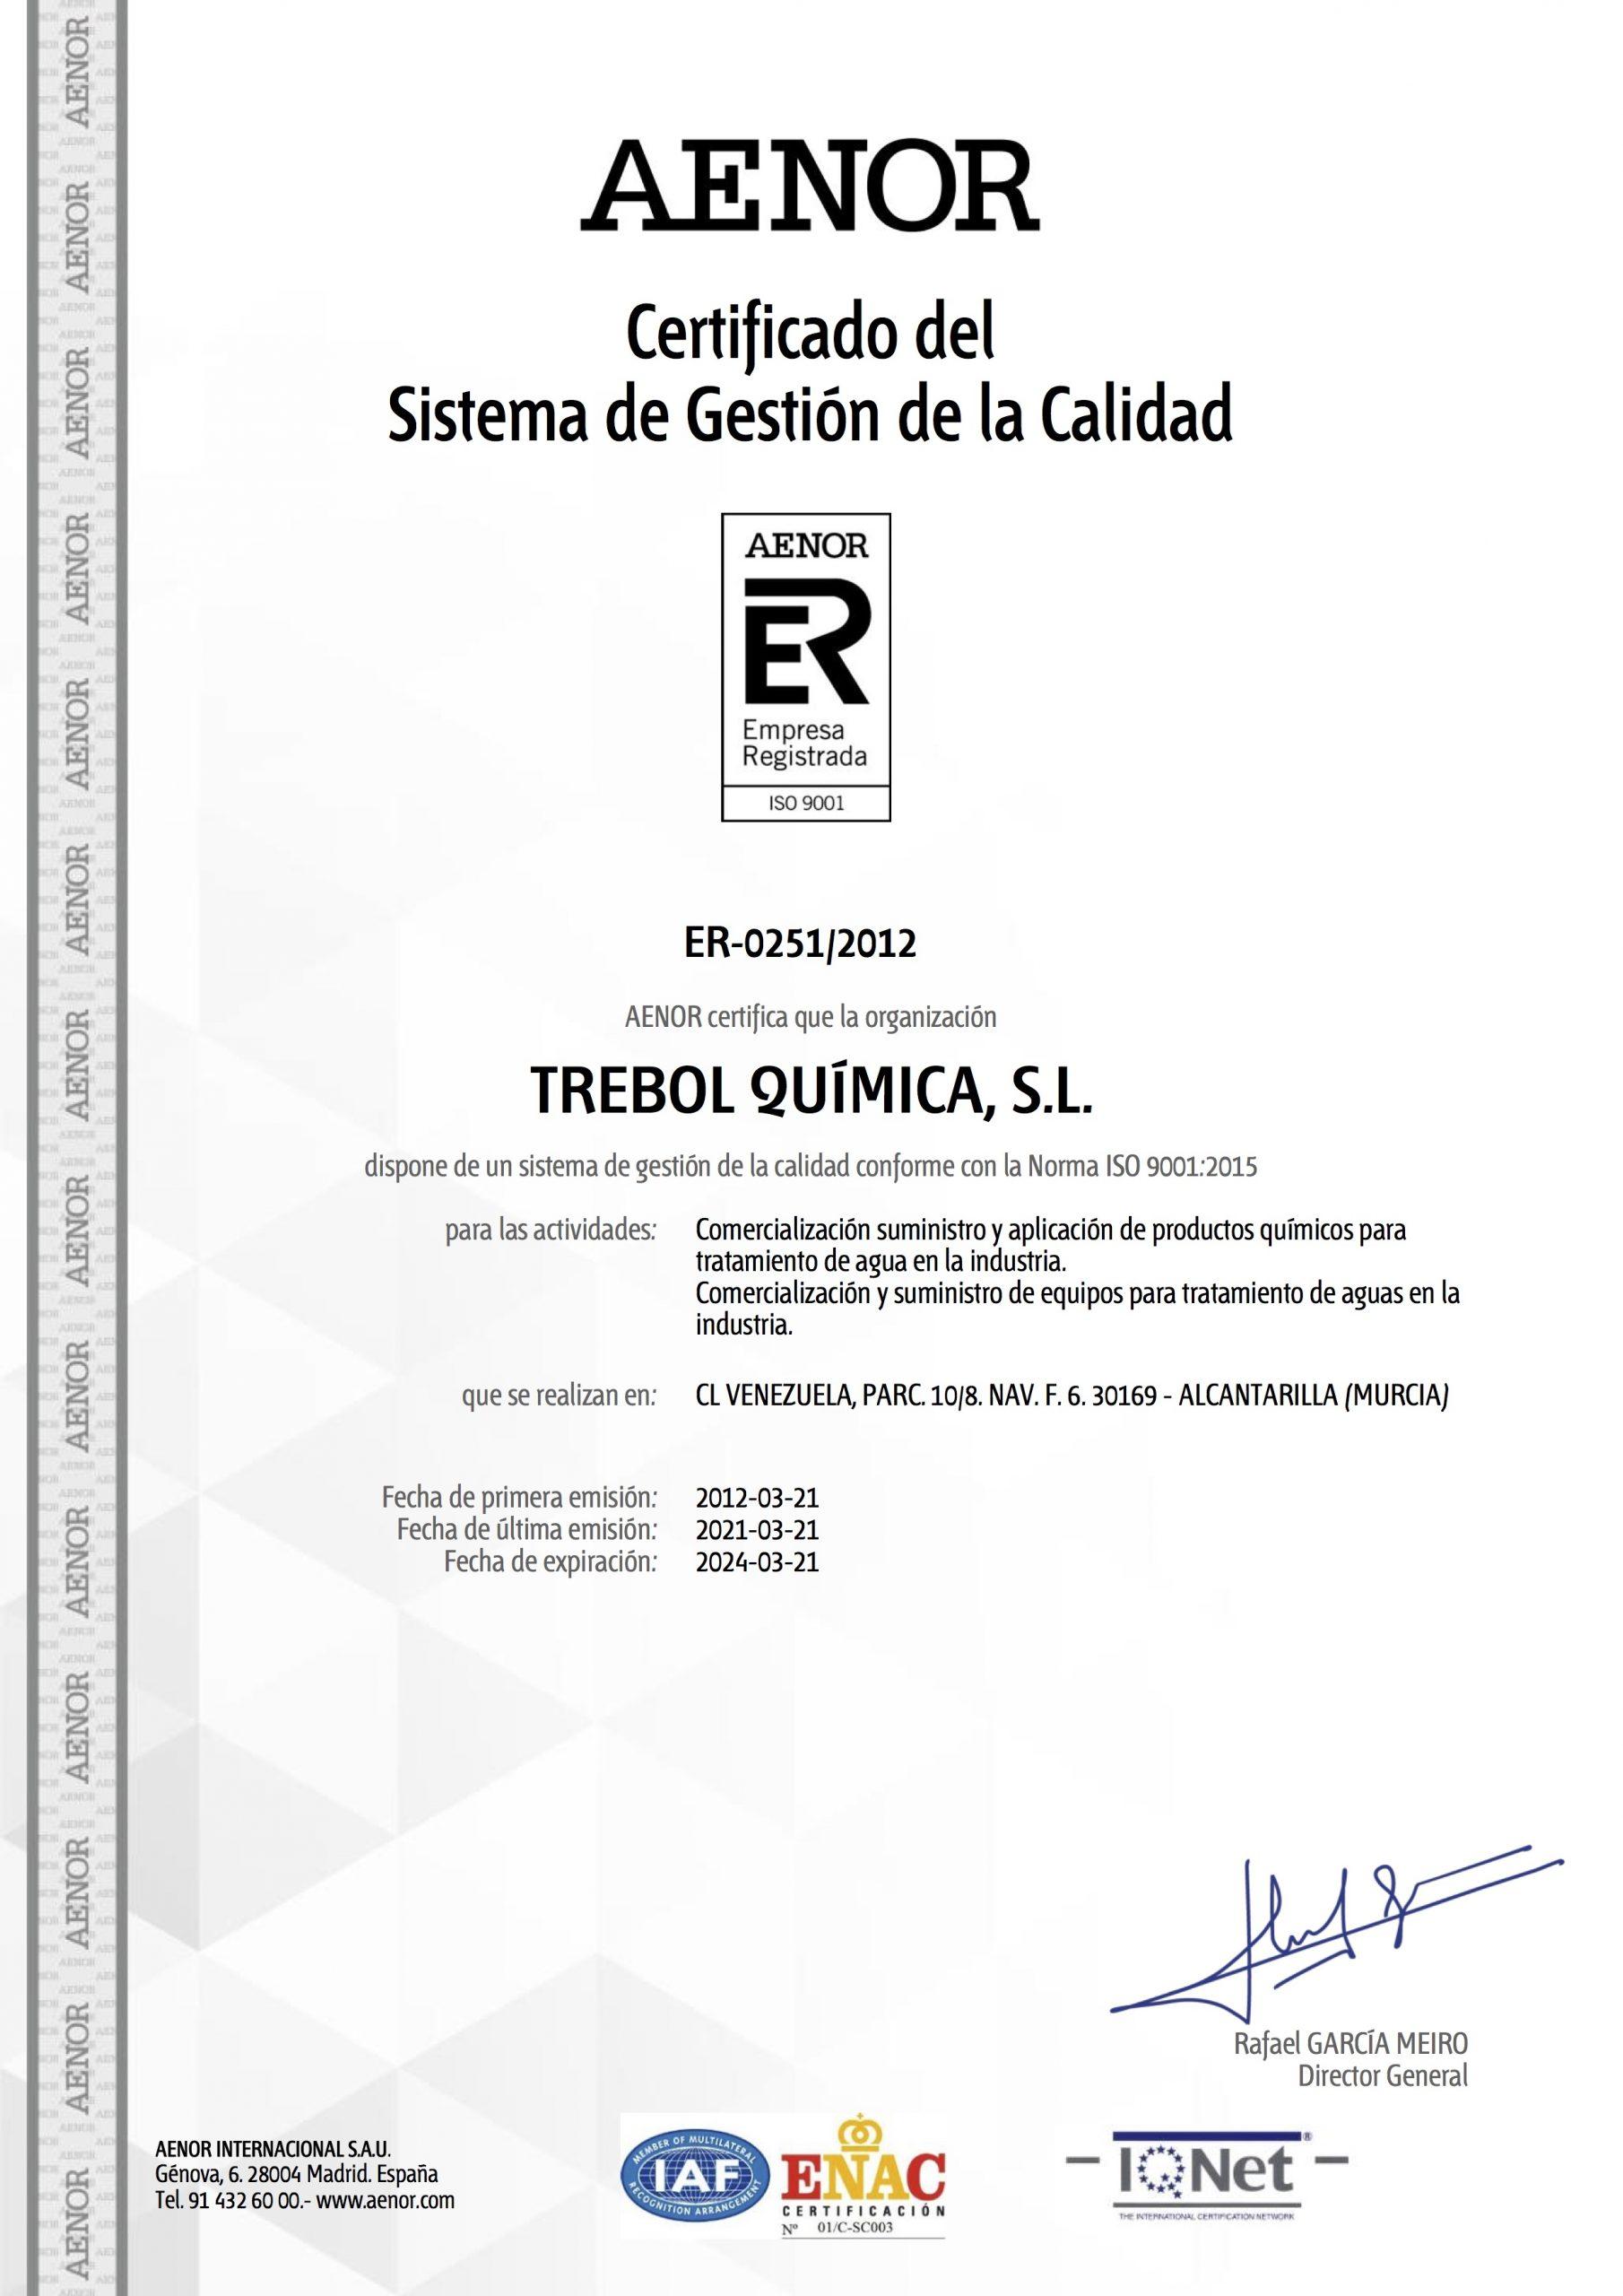 certificadoer-0251-2012_es_2021-03-30